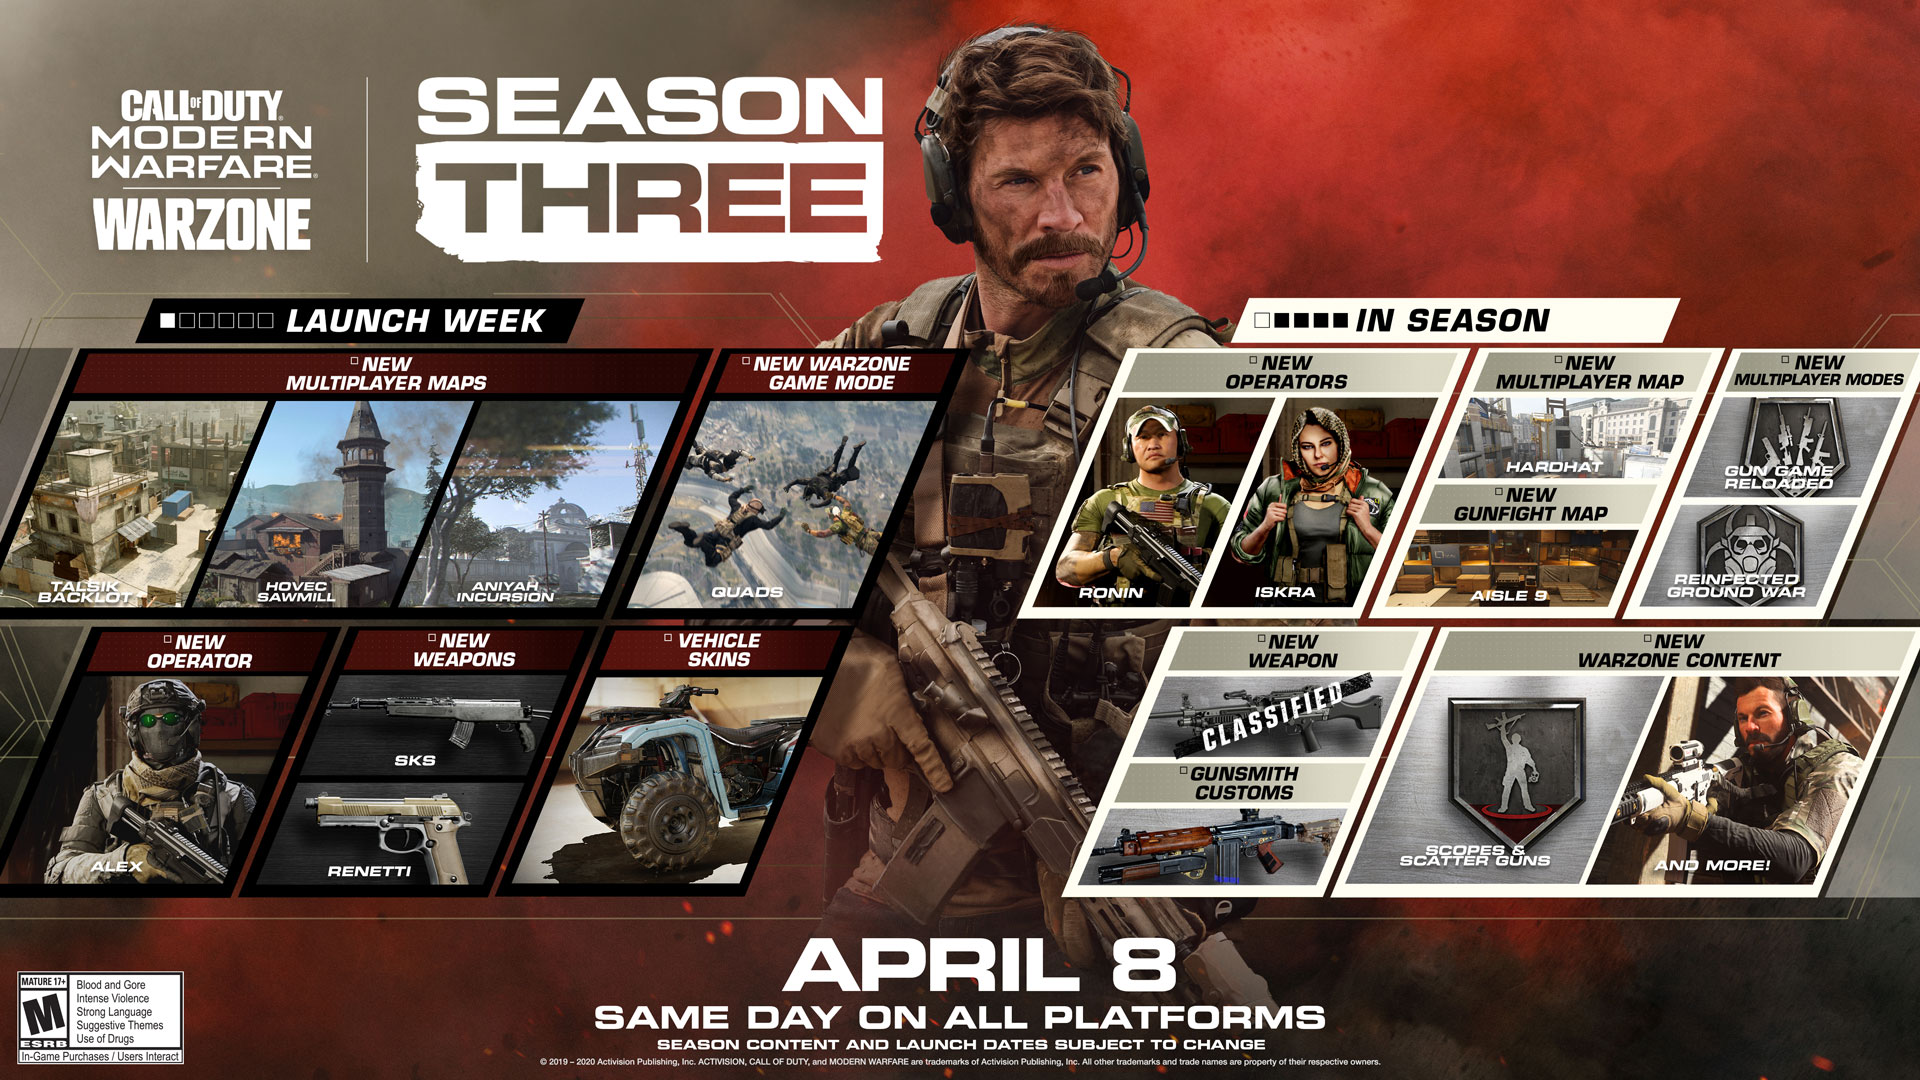 A Hero Returns in Call of Duty®: Modern Warfare® Season Three - Image 8